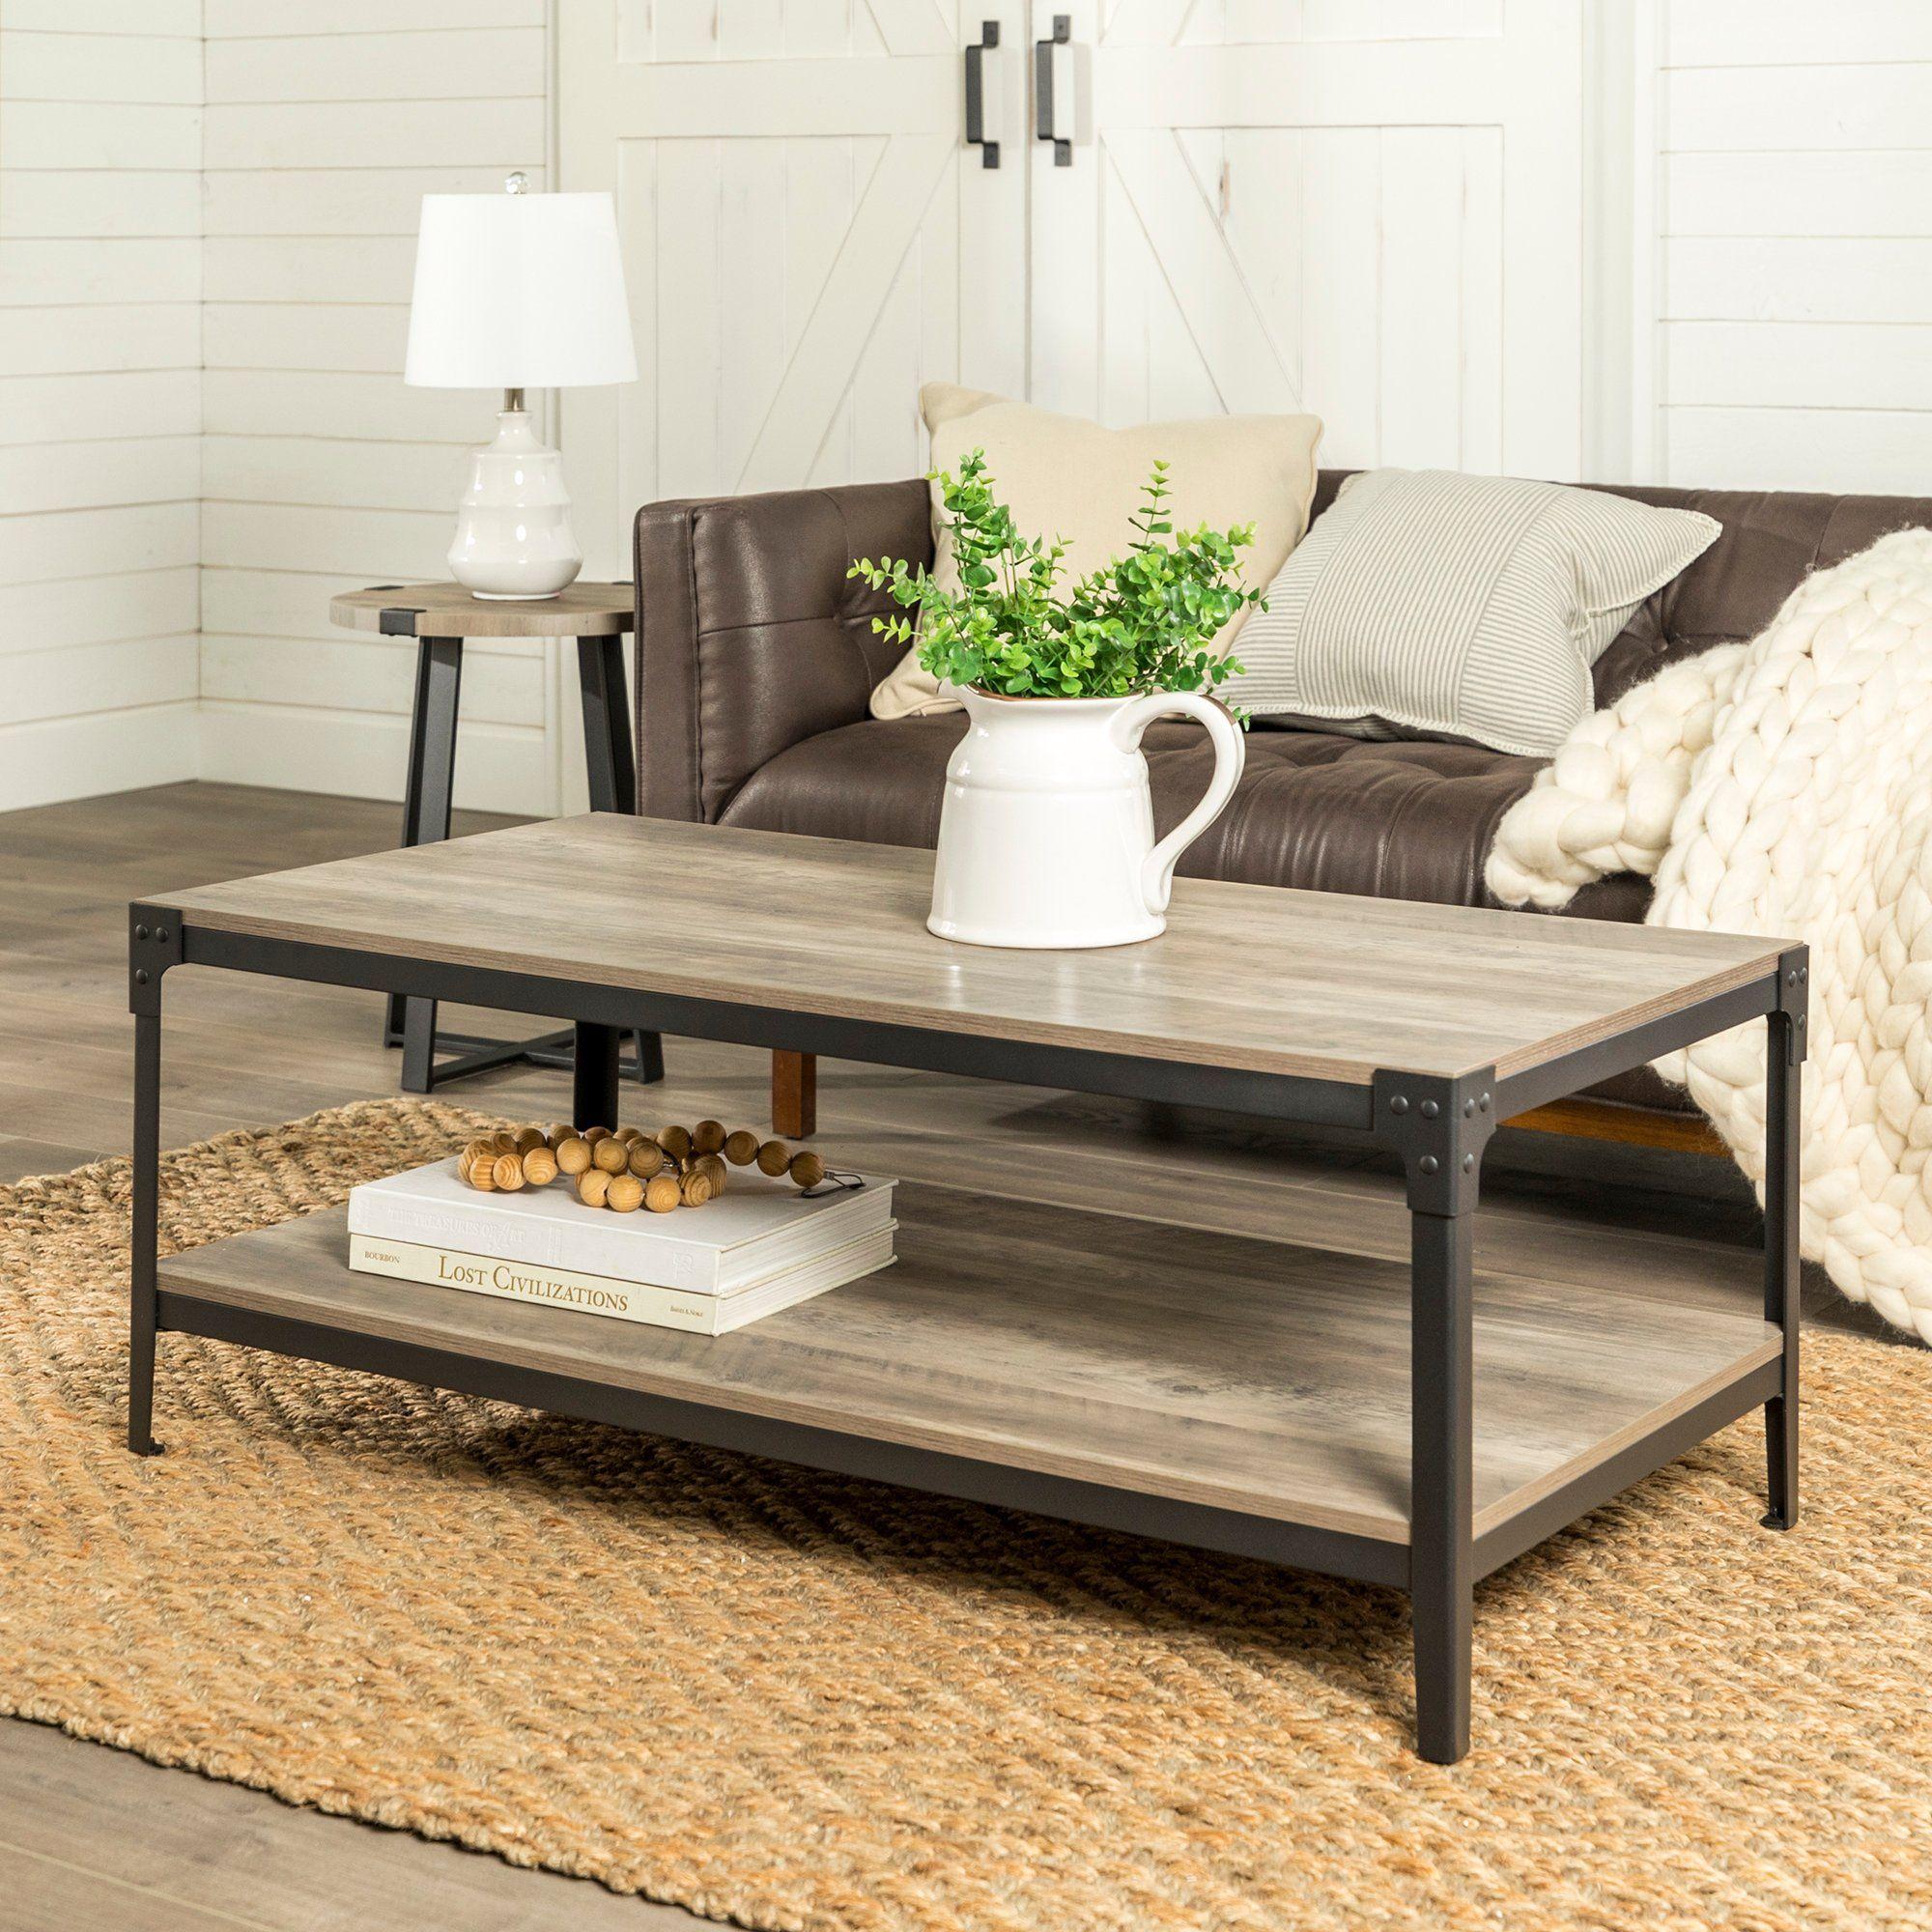 Rustic Wood Coffee Table Gray Wash Living Room Accent Tables Coffee Table Wood Living Room Table [ 2000 x 2000 Pixel ]